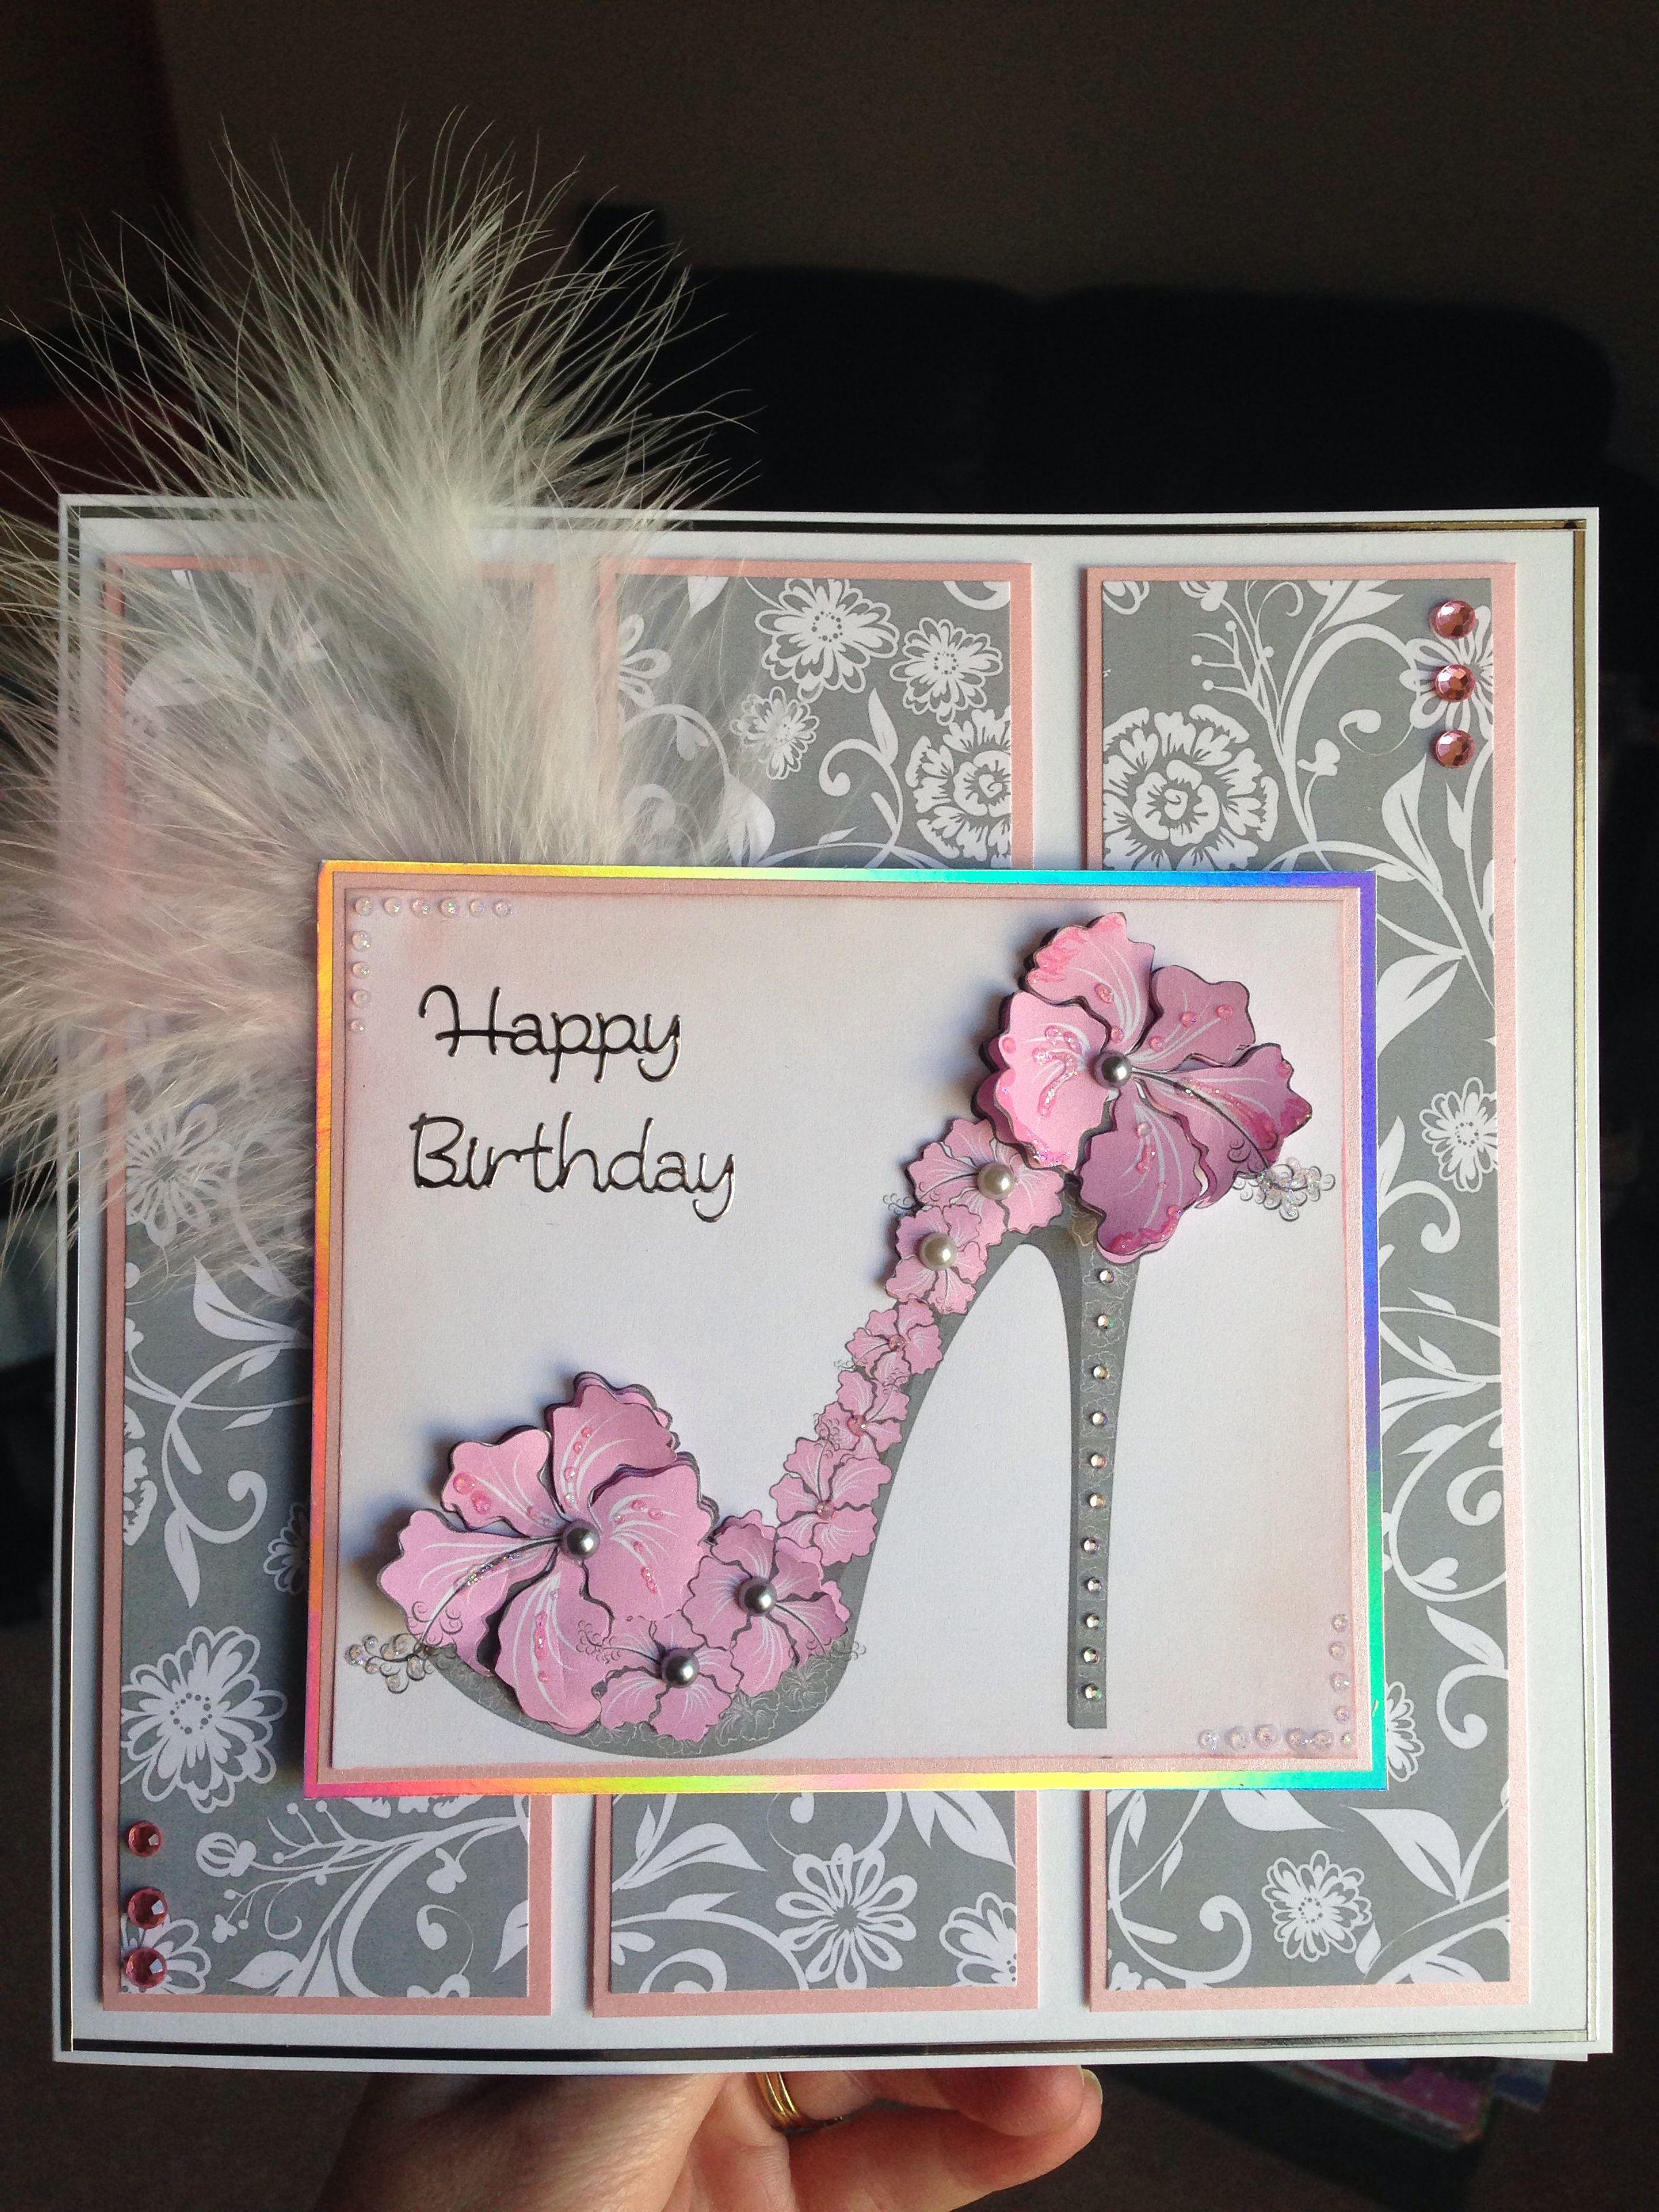 Fancy Shoe Card Kick Up Your Heels Have Fun Card Making Birthday Handmade Birthday Cards Creative Cards